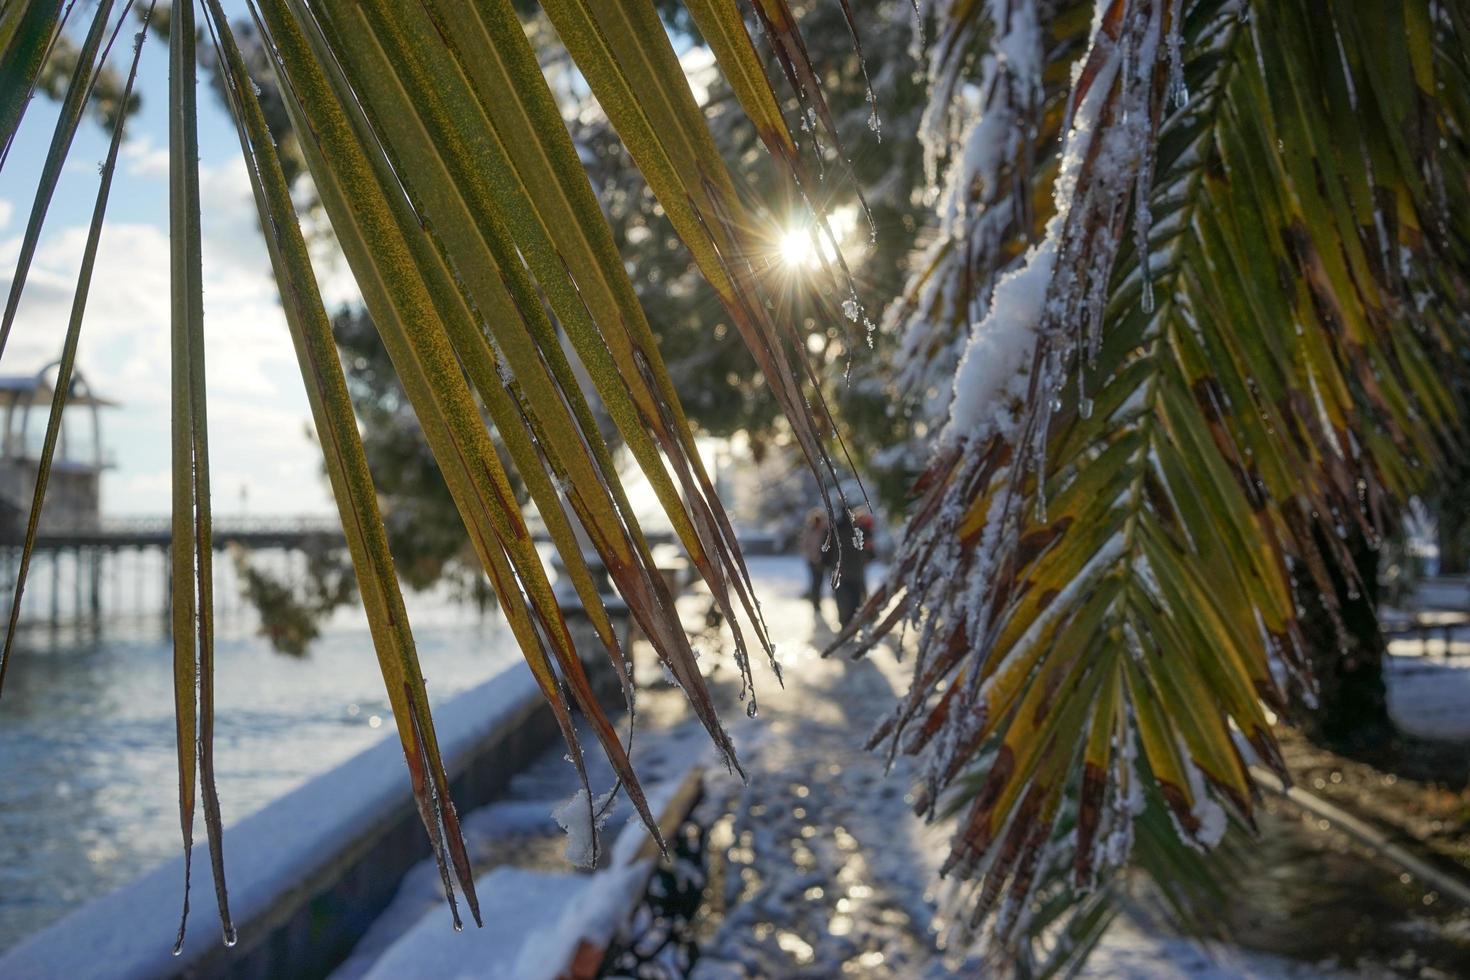 las hojas de la palma de abanico washingtonia con gotas de agua foto